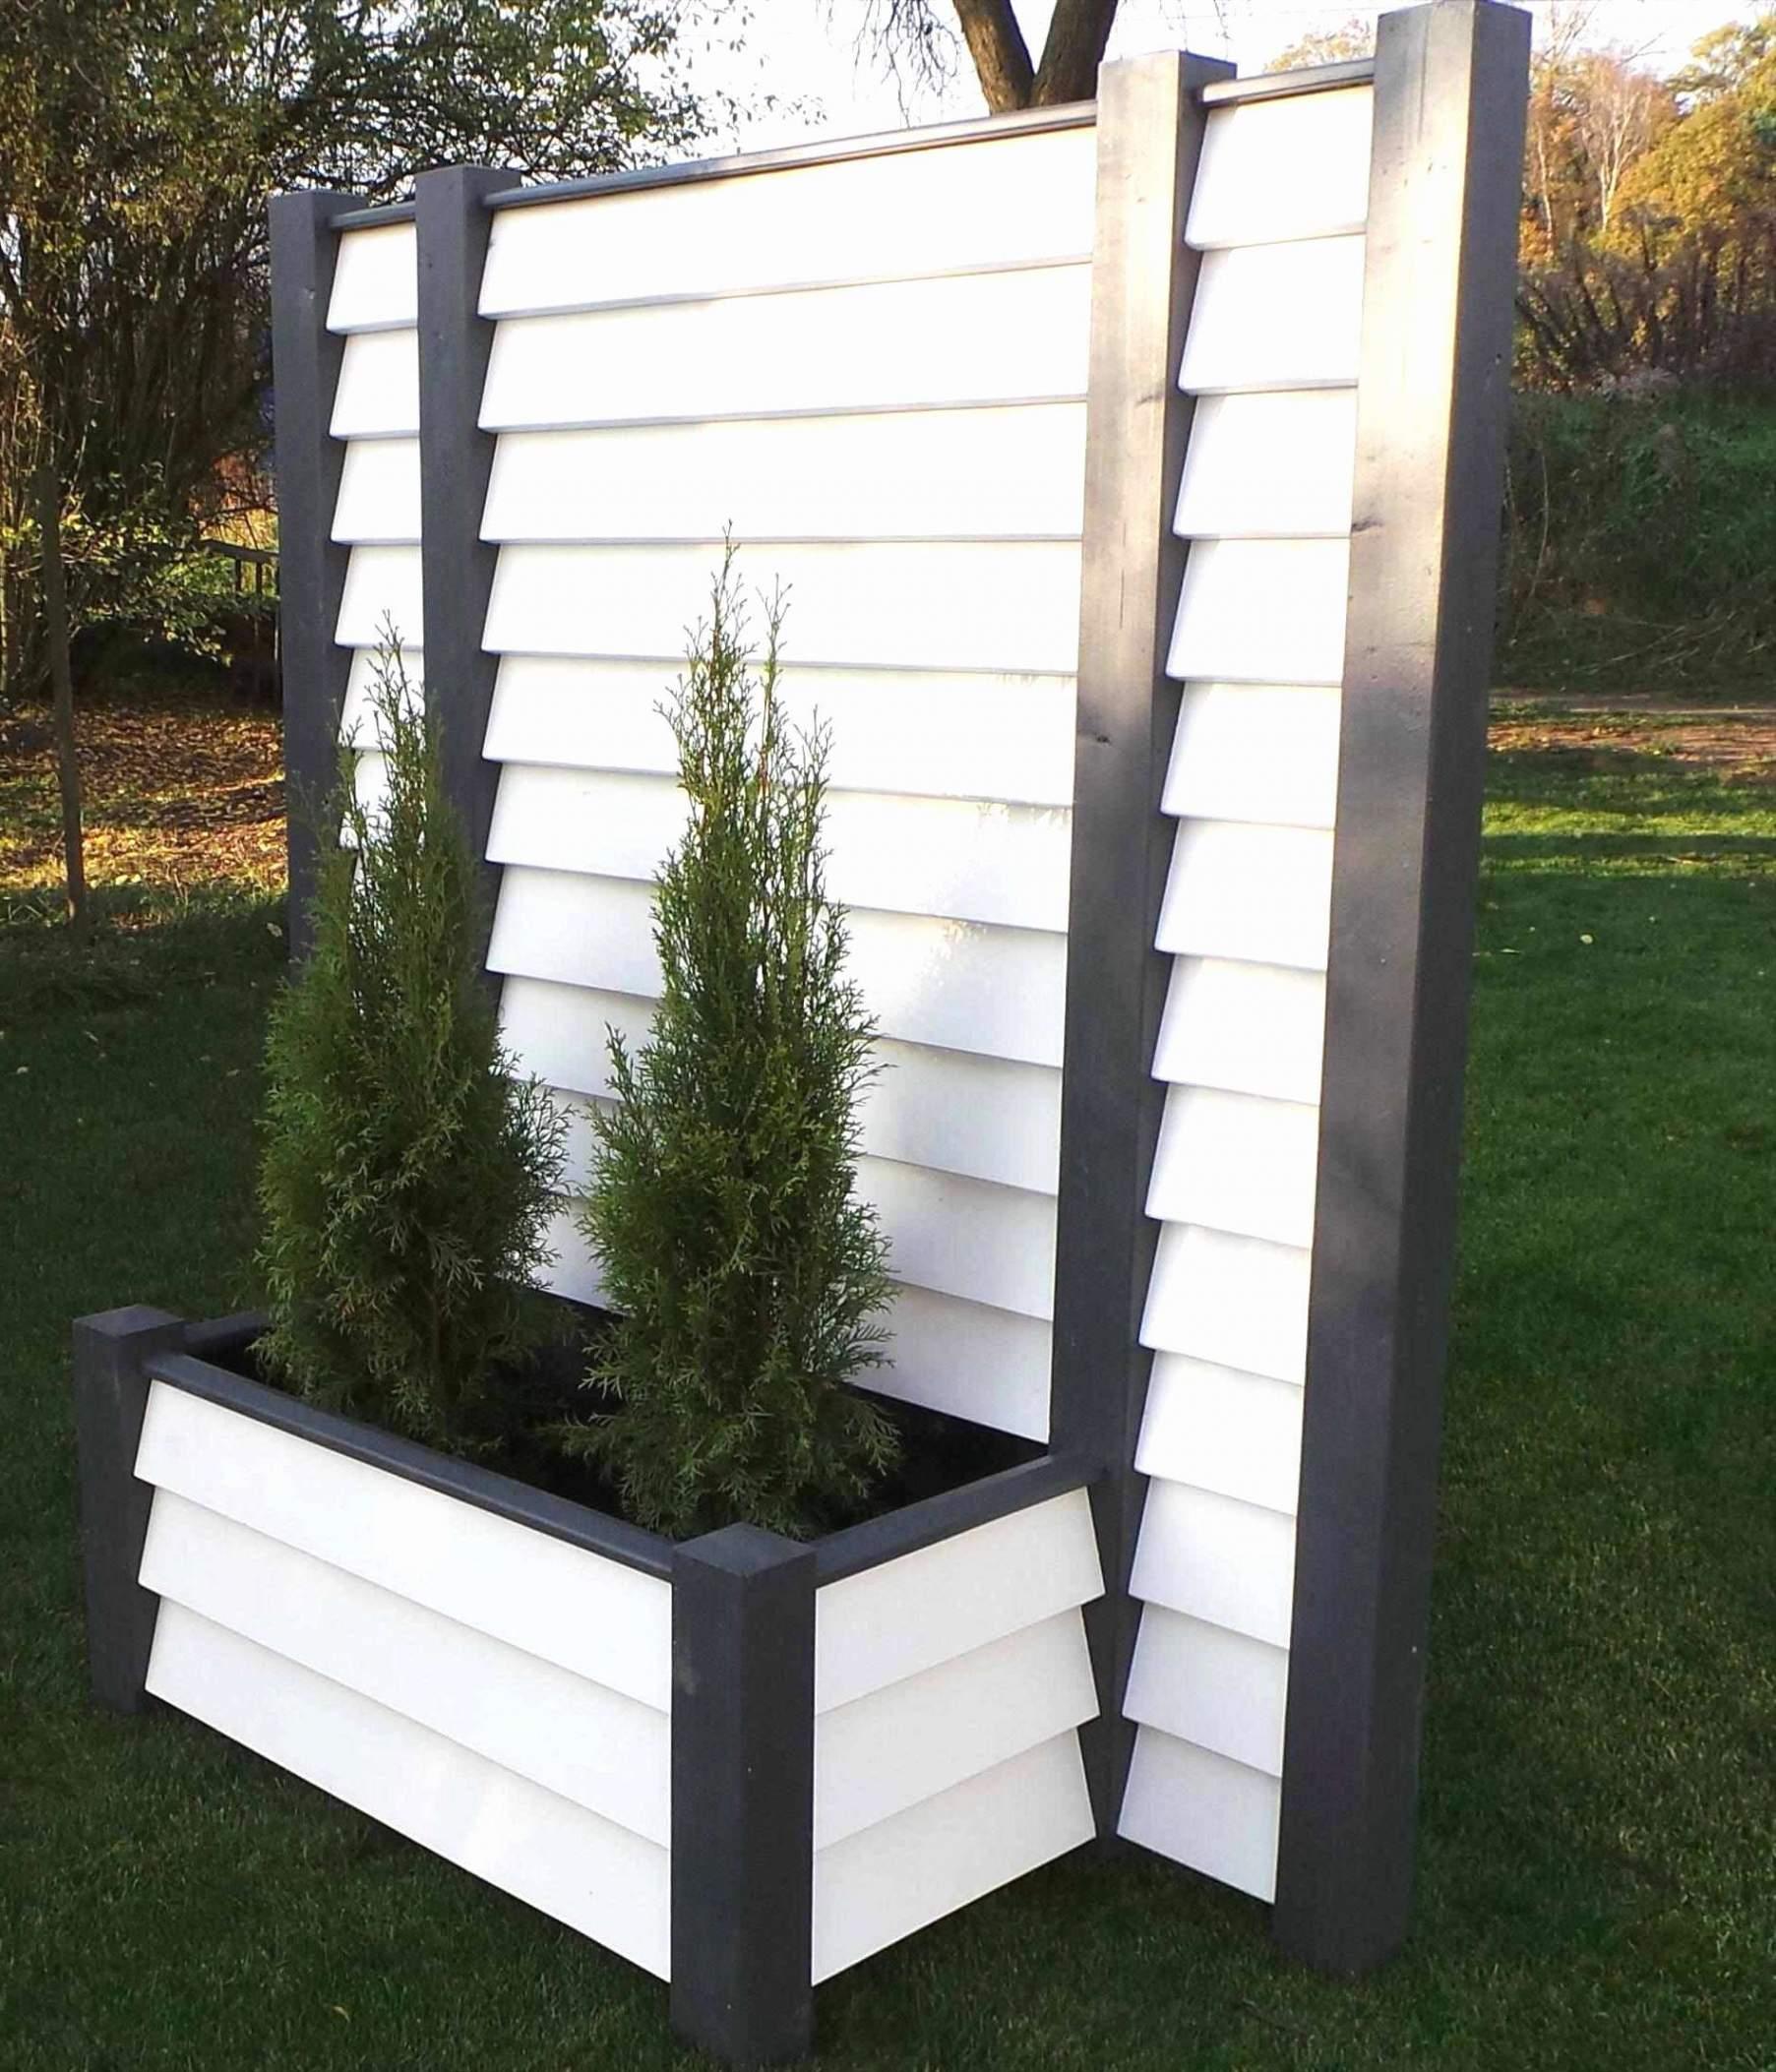 46 kollektion terrassenuberdachung mit lamellen stock osb platten mobel osb platten mobel